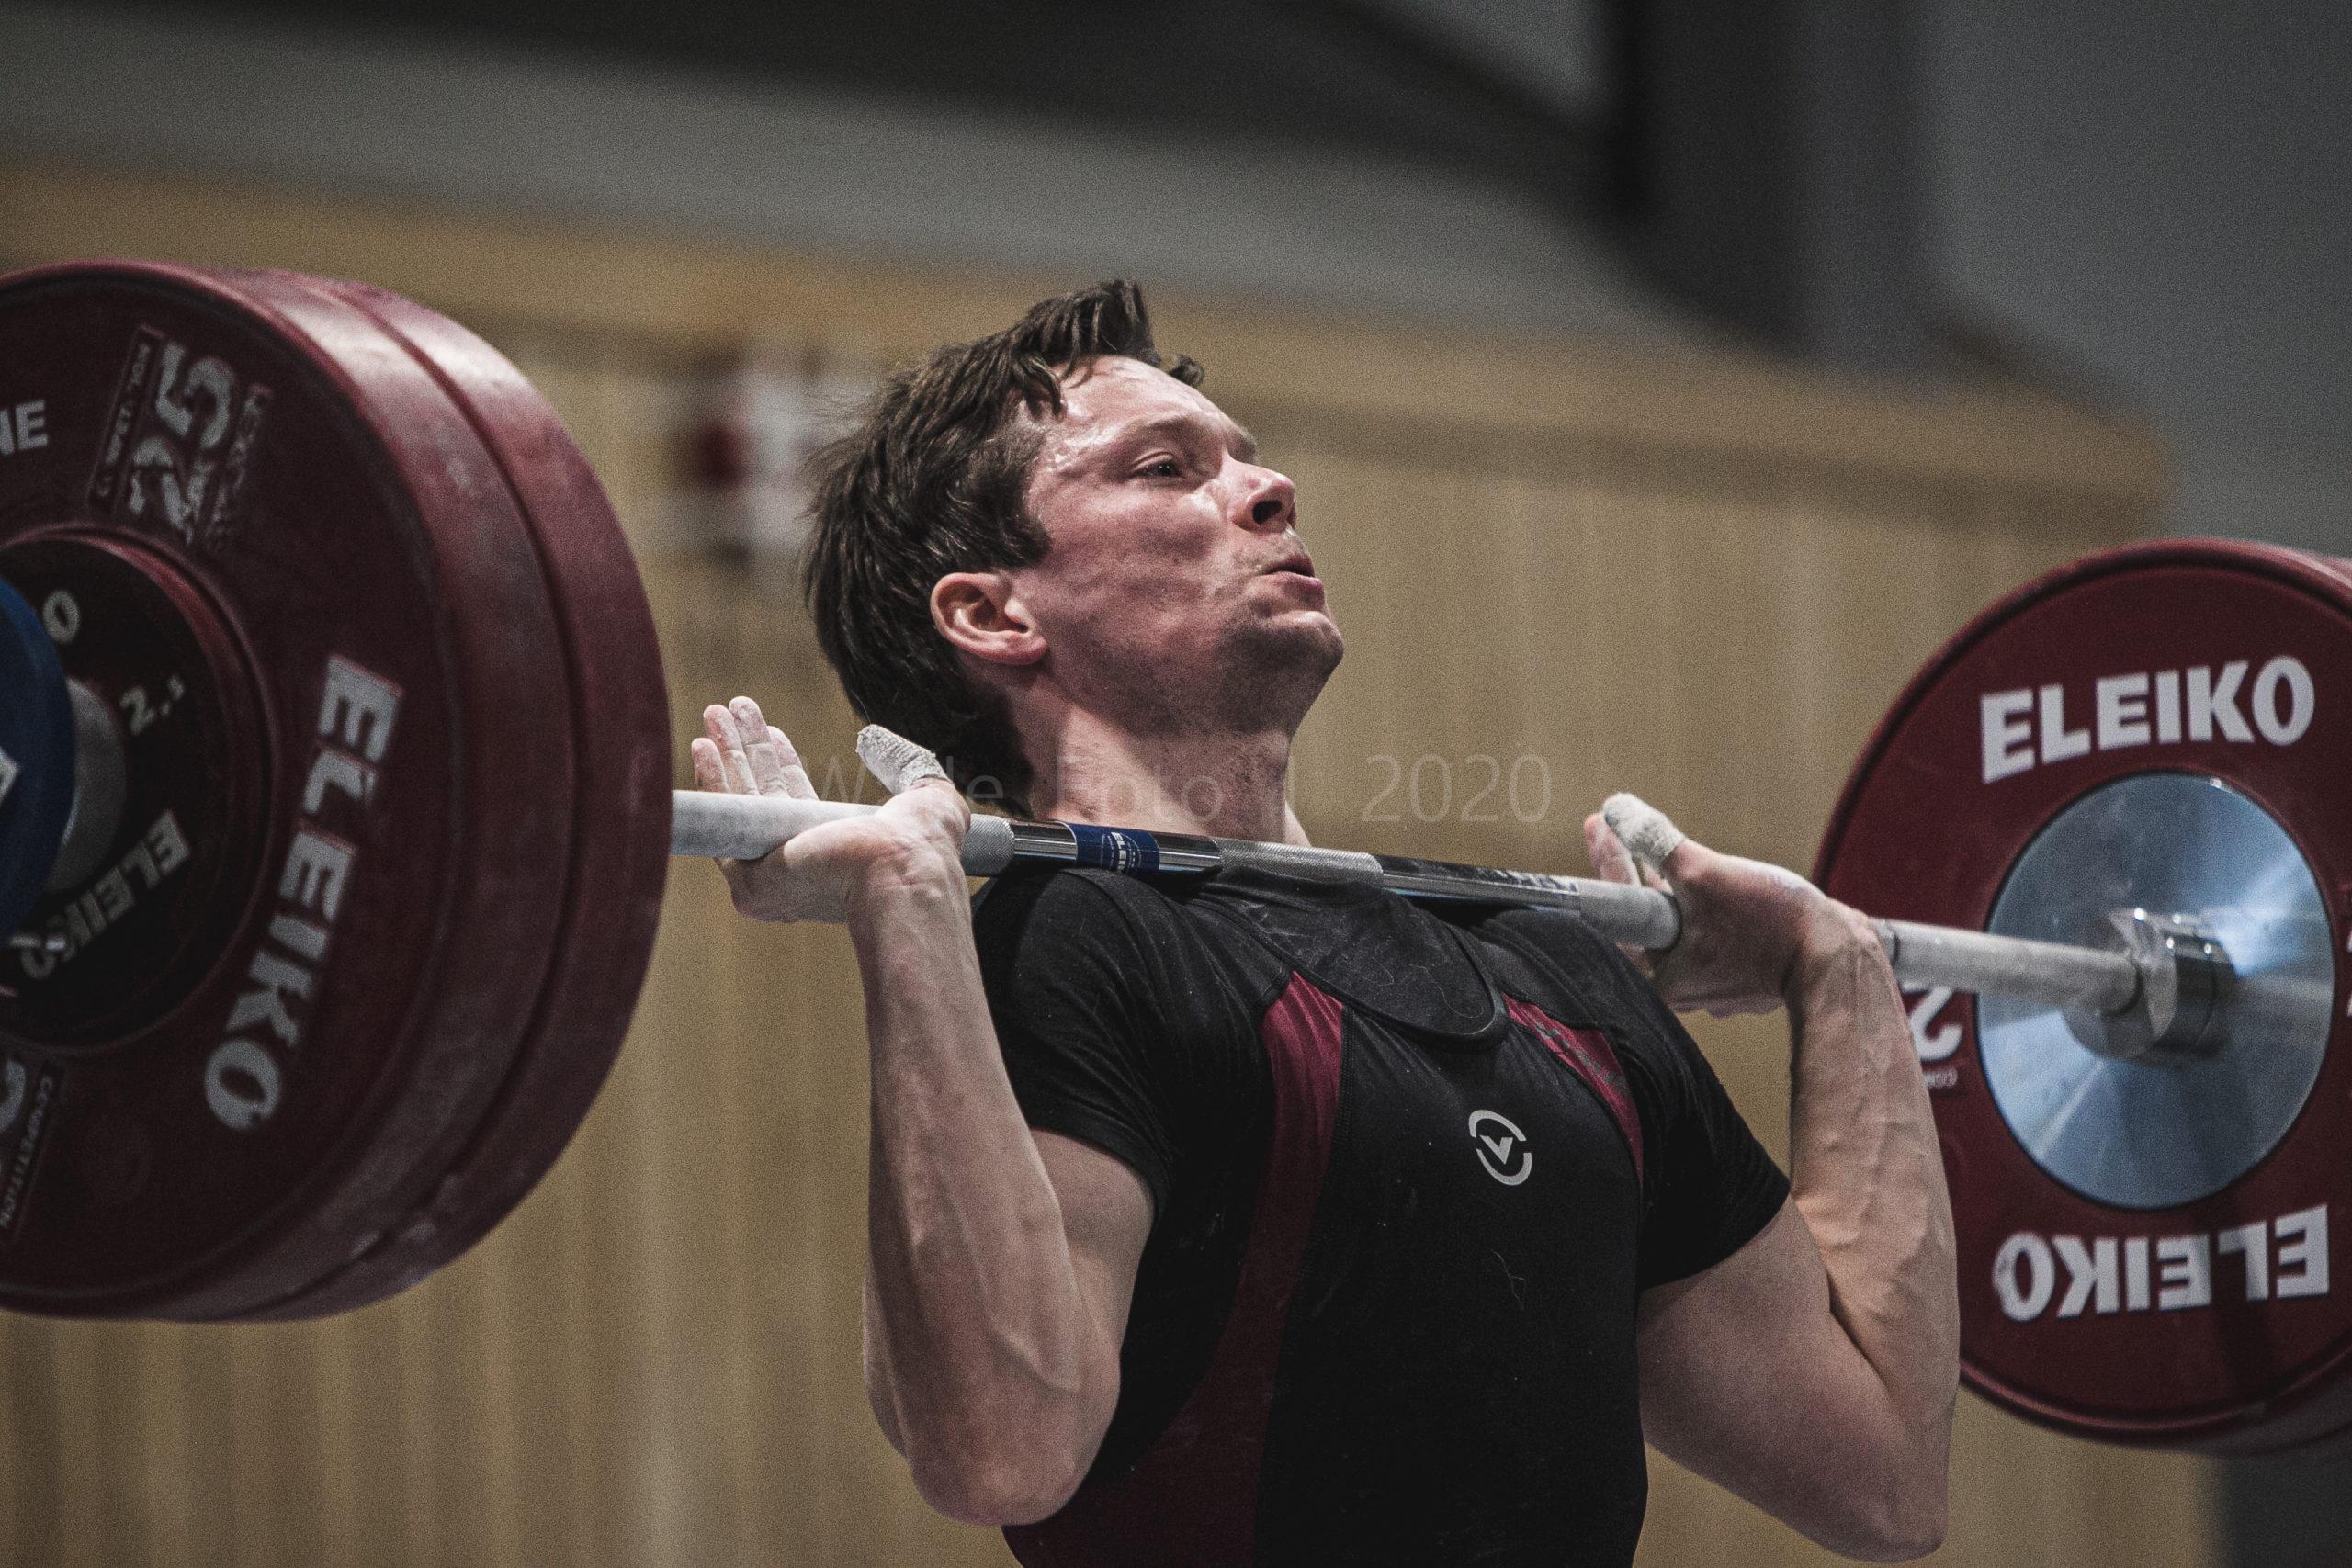 Østlandsmesterskap 2020 – nok en suksess!